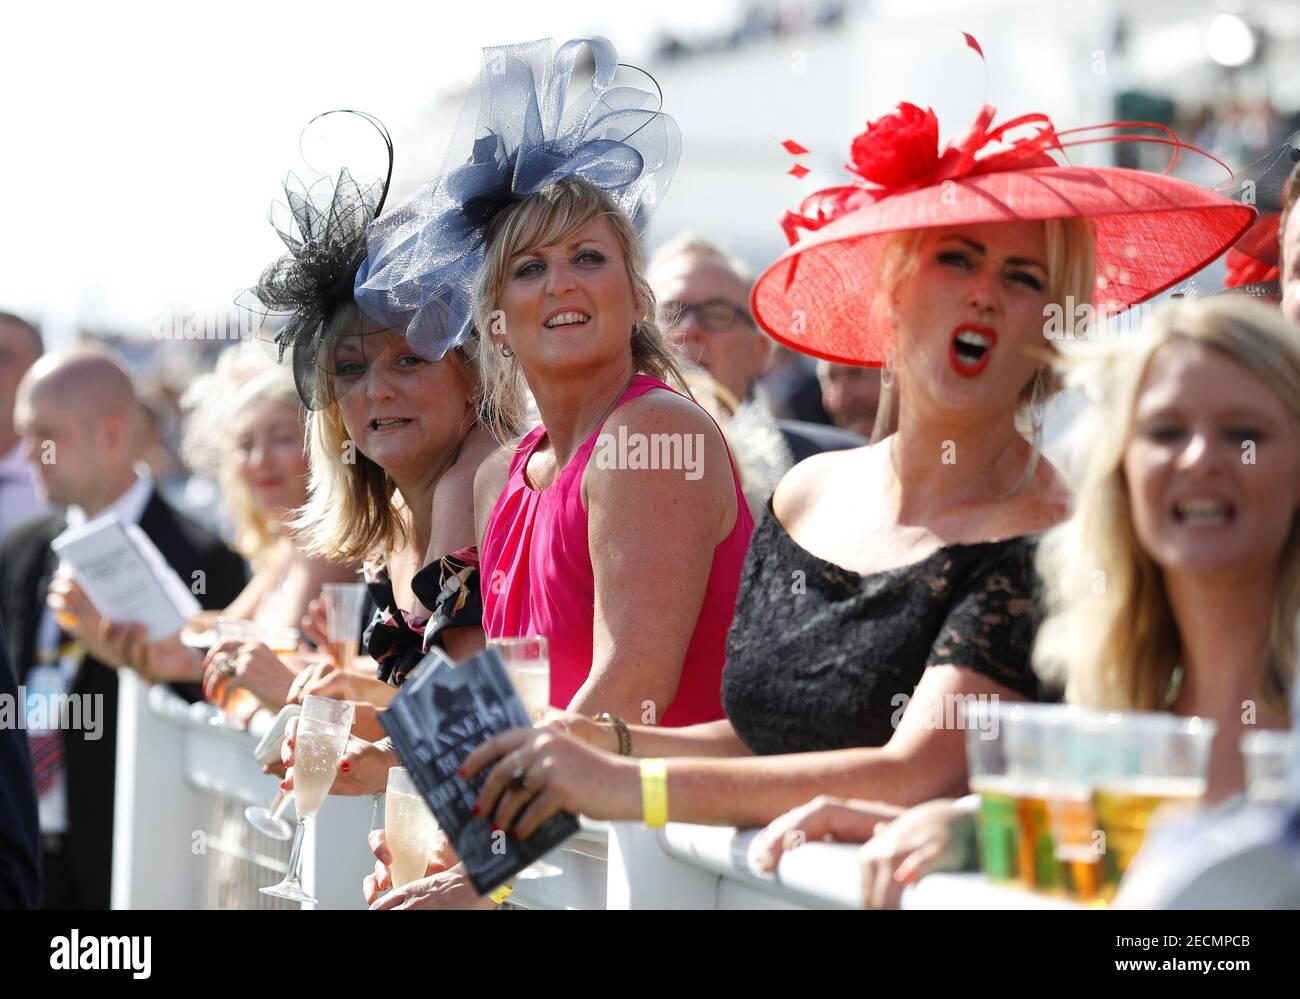 Horse Racing - Derby Festival - Epsom Downs Racecourse, Epsom, Britain - June 1, 2018   Racegoers during the 4.30 Investec Oaks   REUTERS/Peter Nicholls Stock Photo